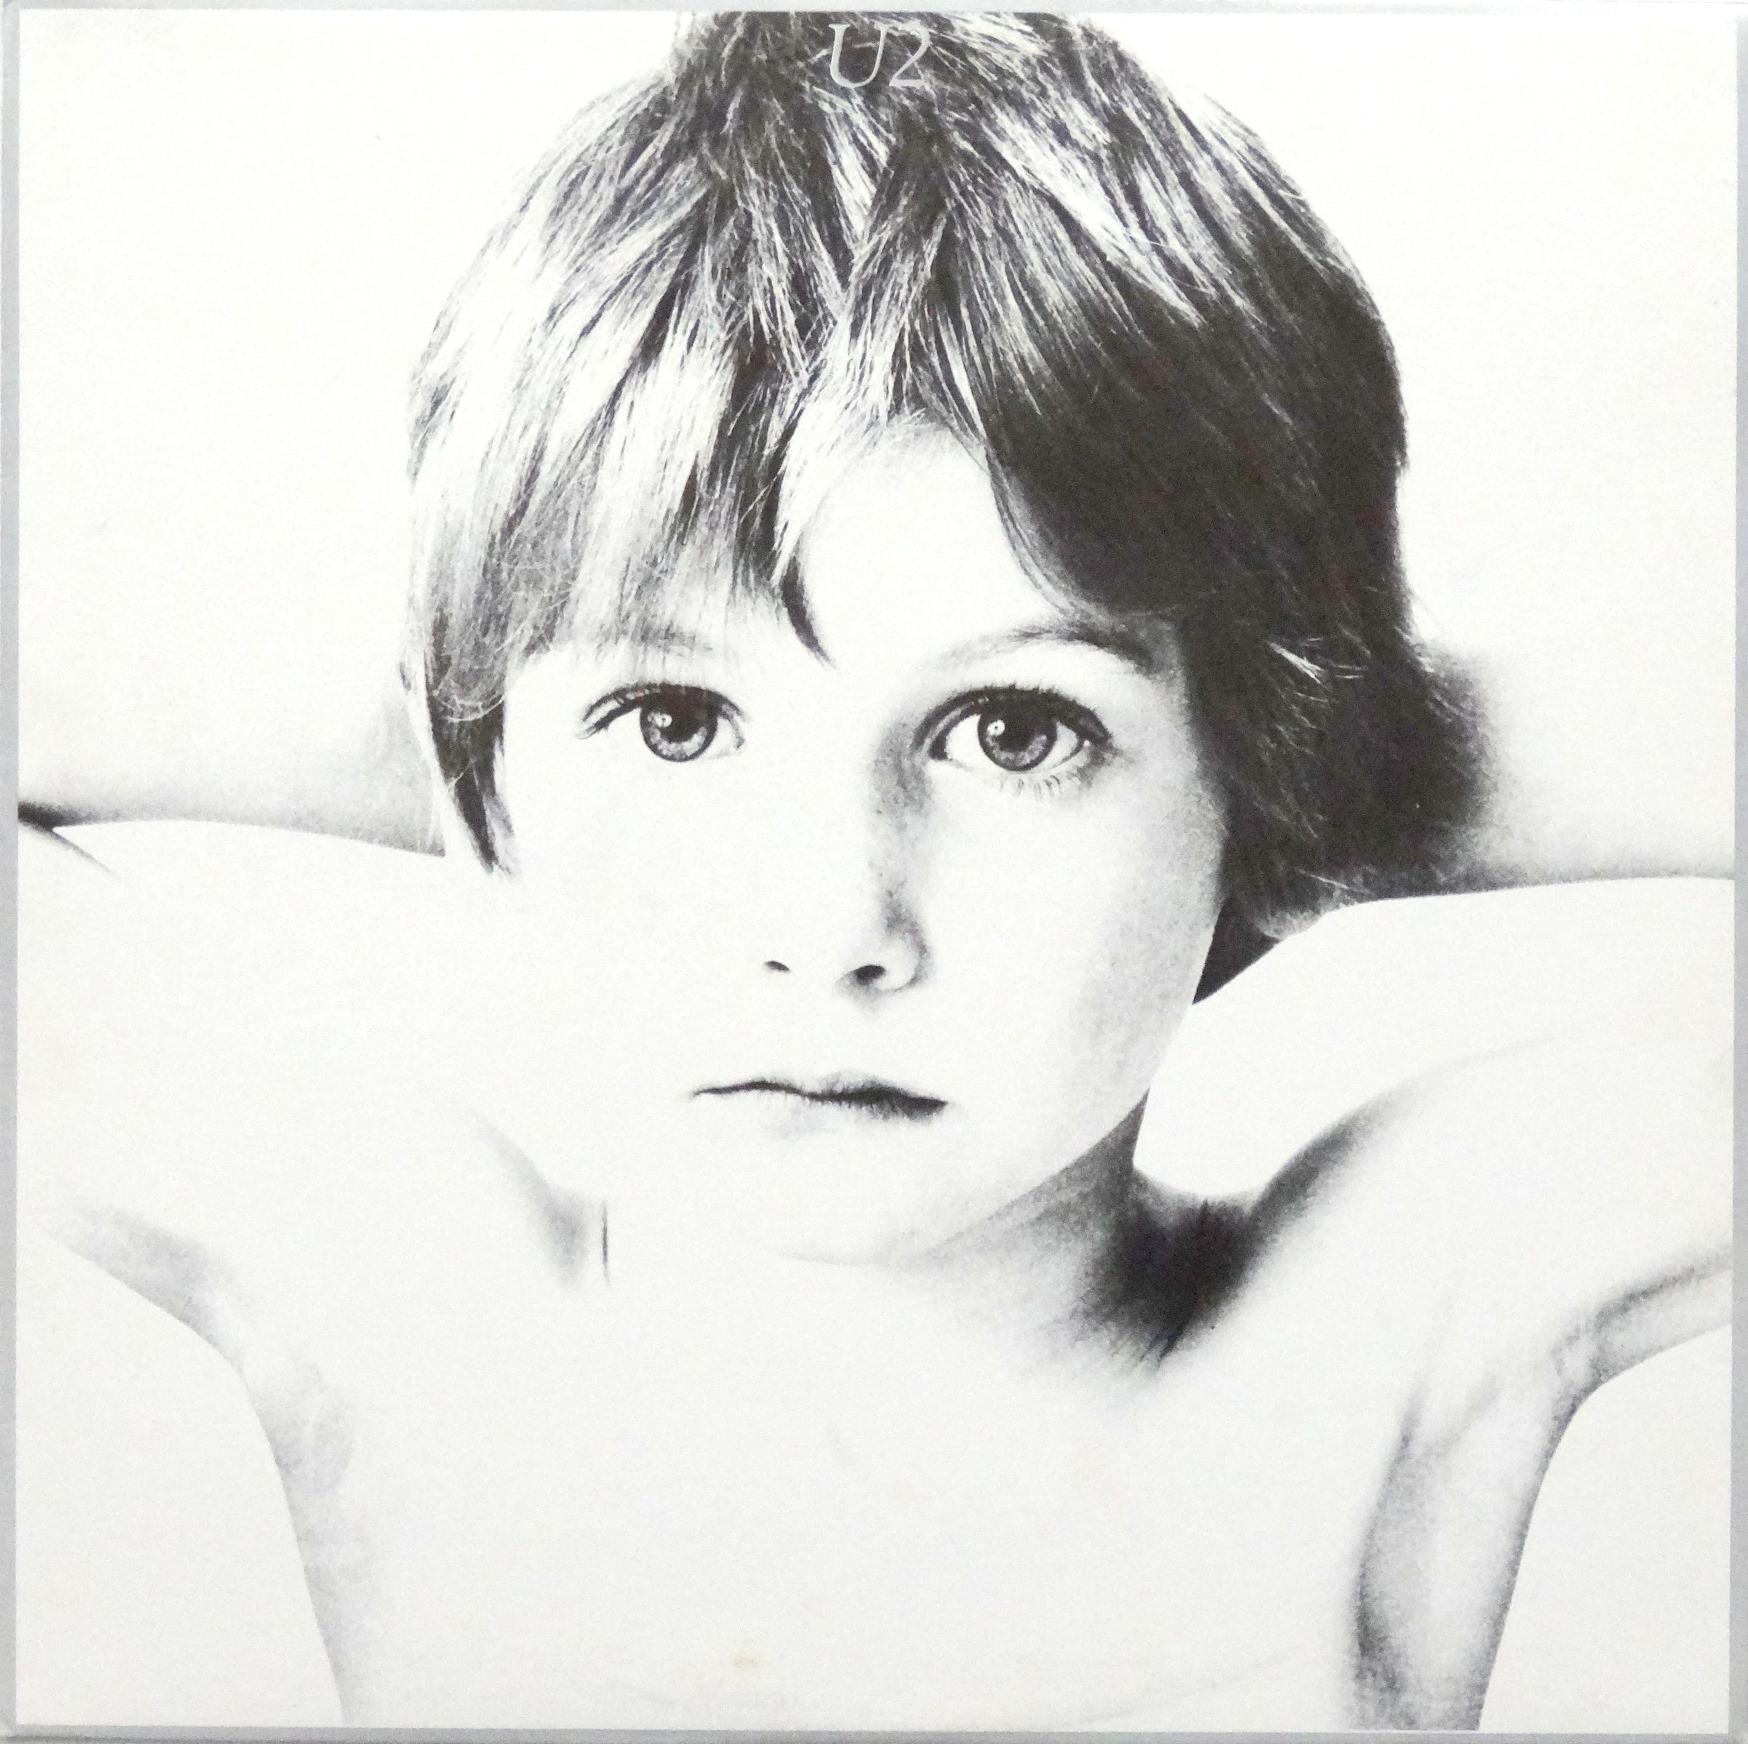 U2 - Boy / October